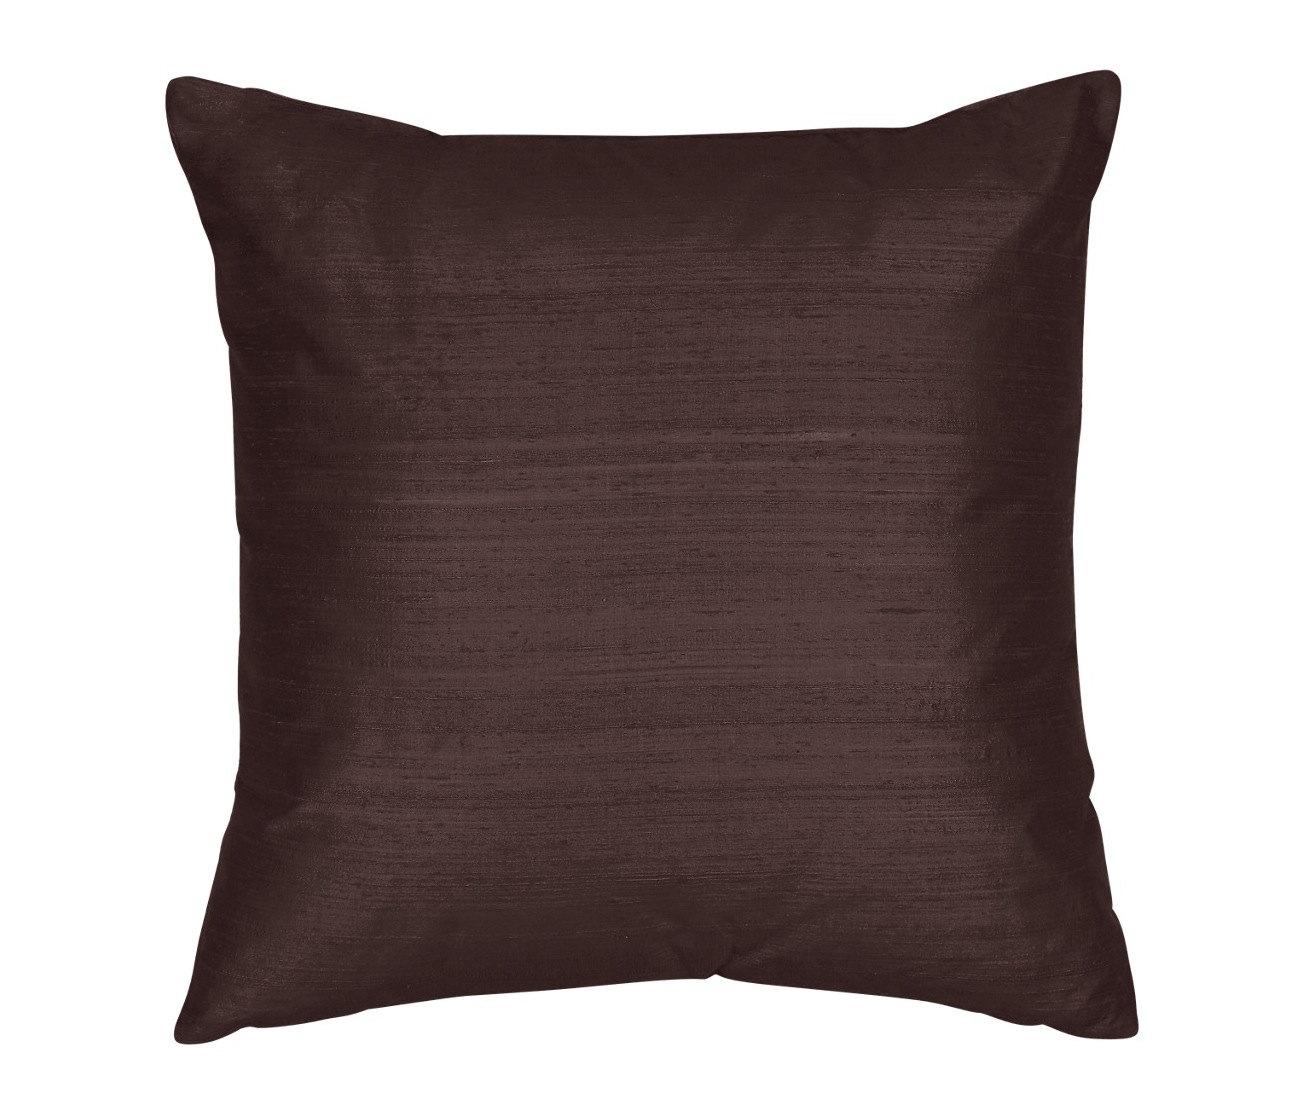 Throw Pillows Us : Throw Pillow Cover Silk Shantung Decorative Pillow 16 inch